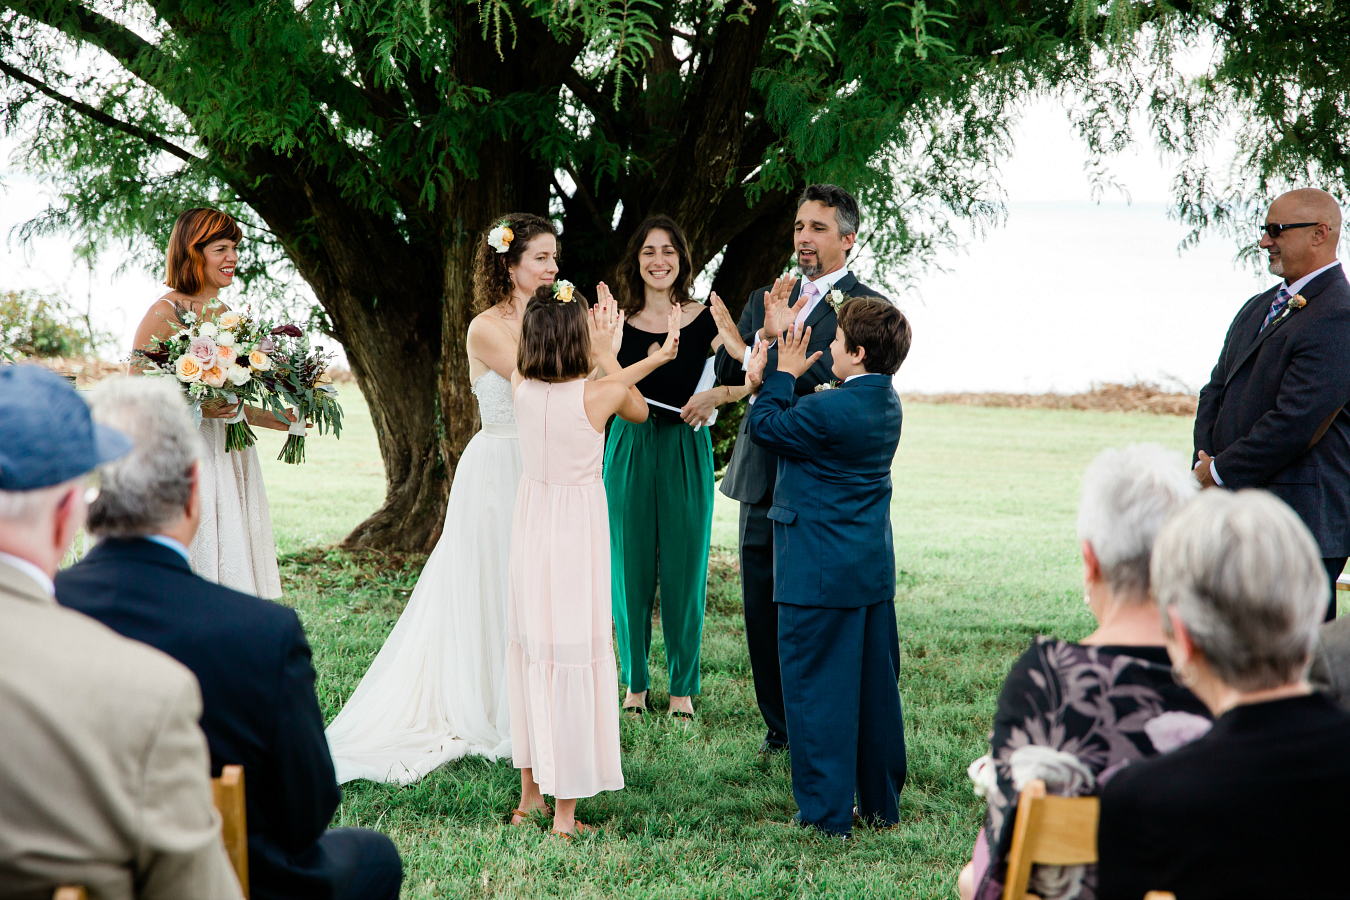 Family Handshake : How to Include Children in Blended Family Wedding